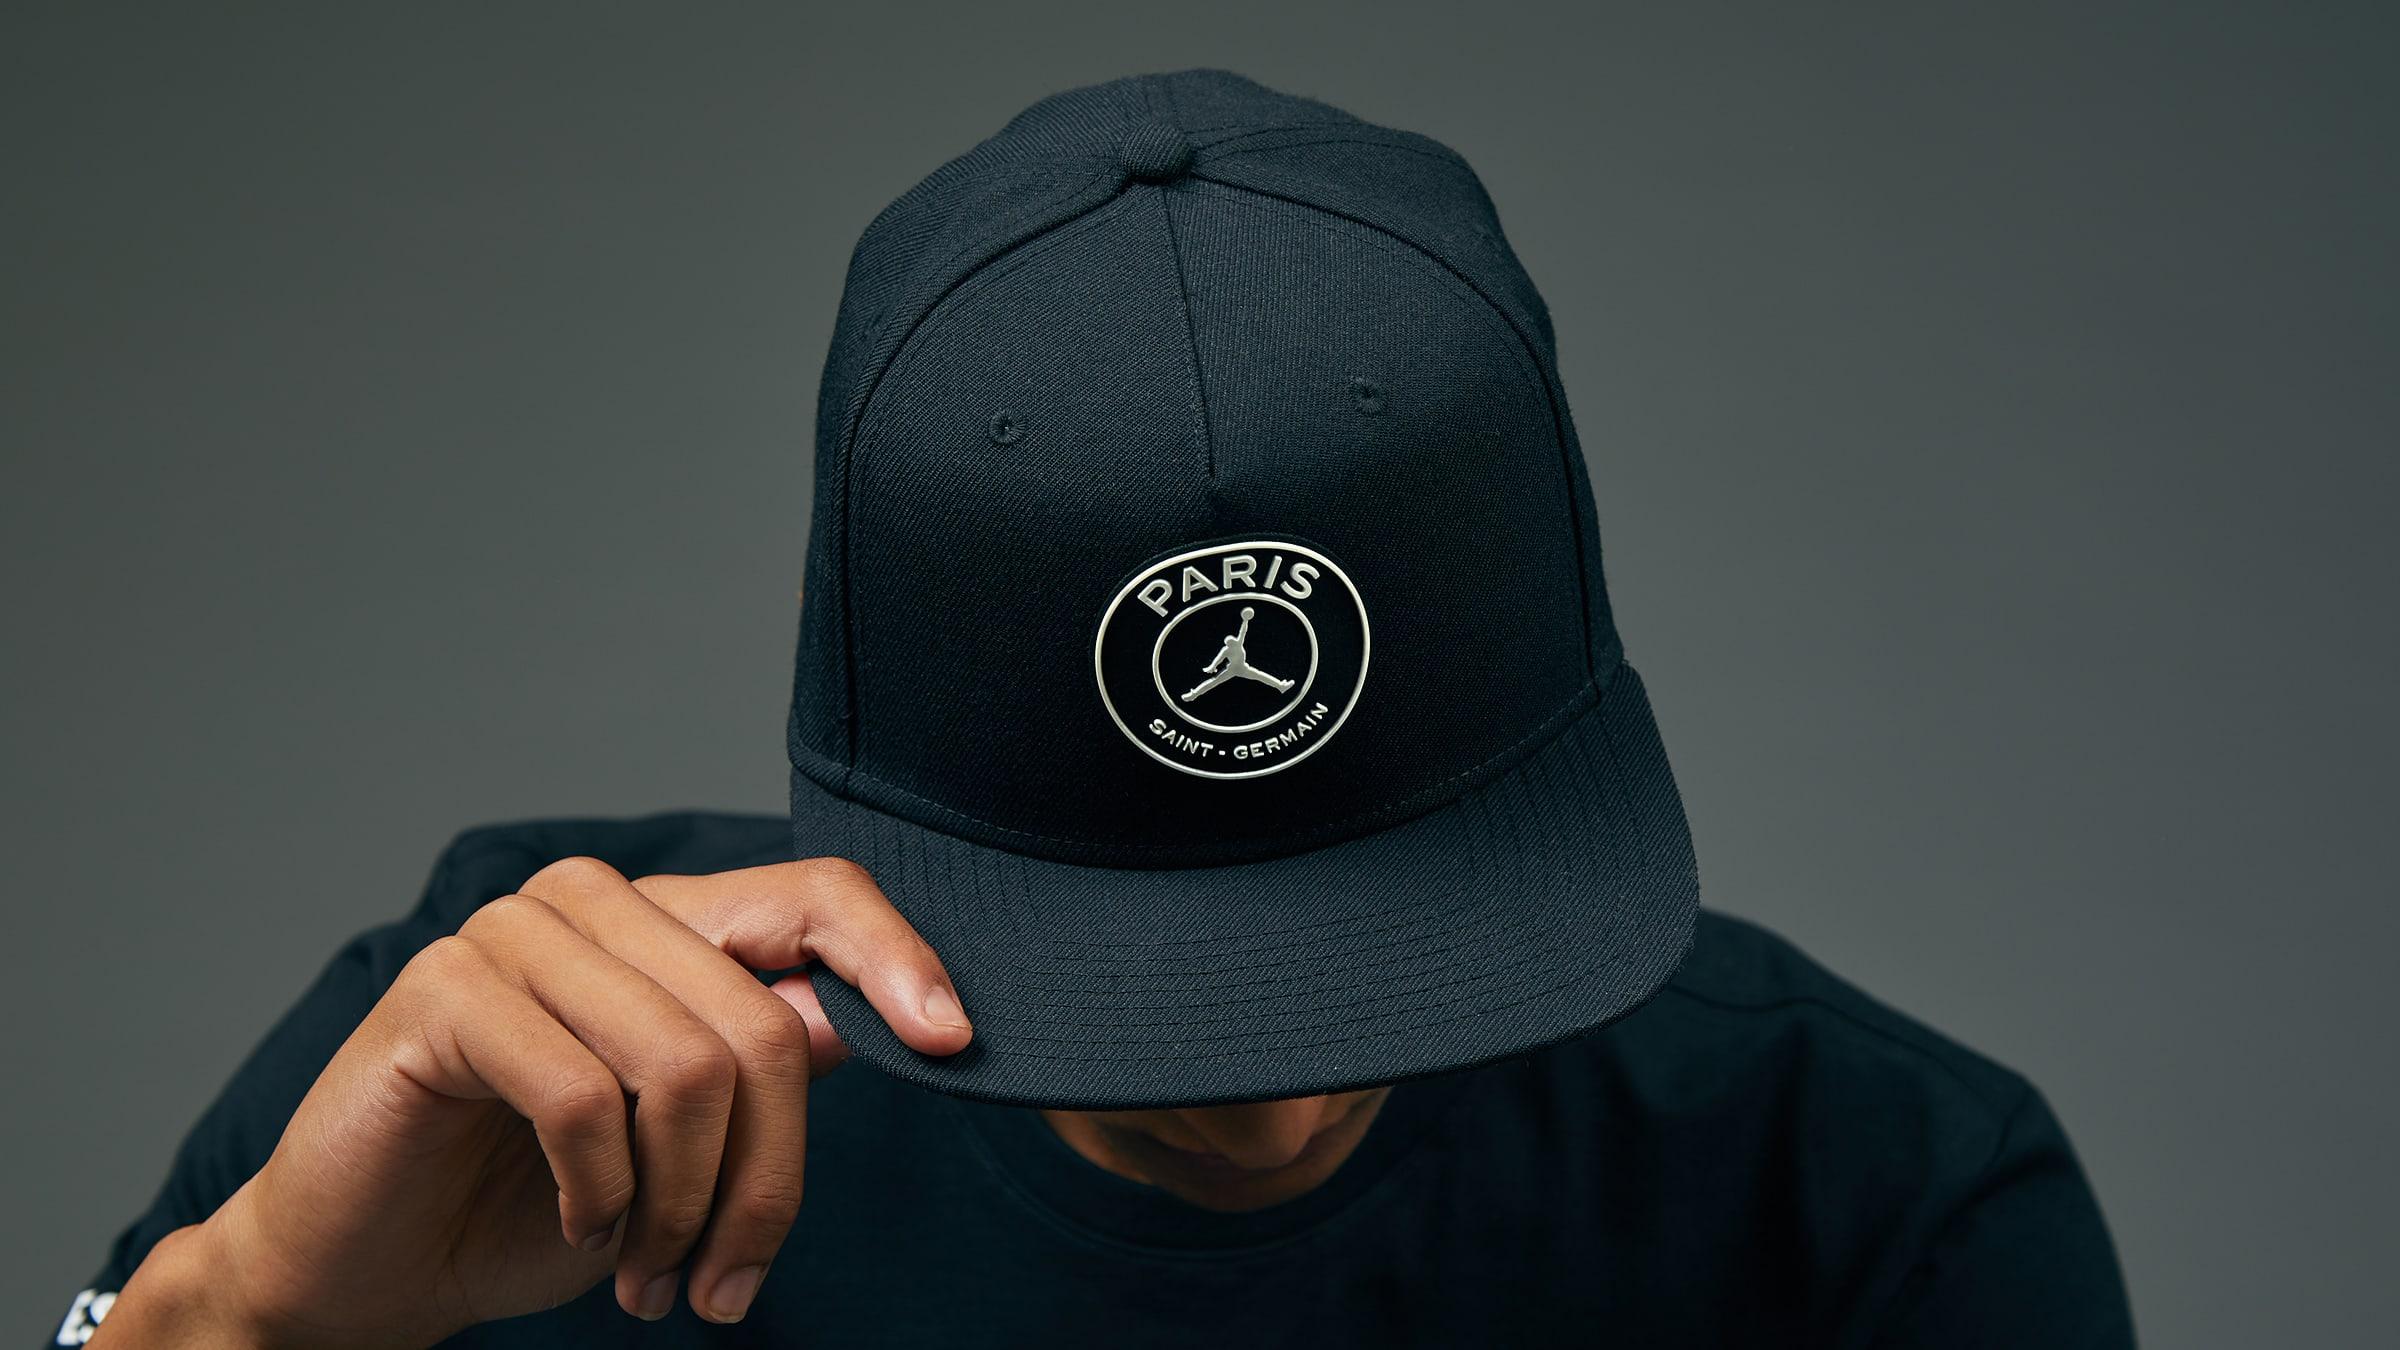 dc9e9c0499e Jordan x Paris Saint-Germain Pro Cap (Black)